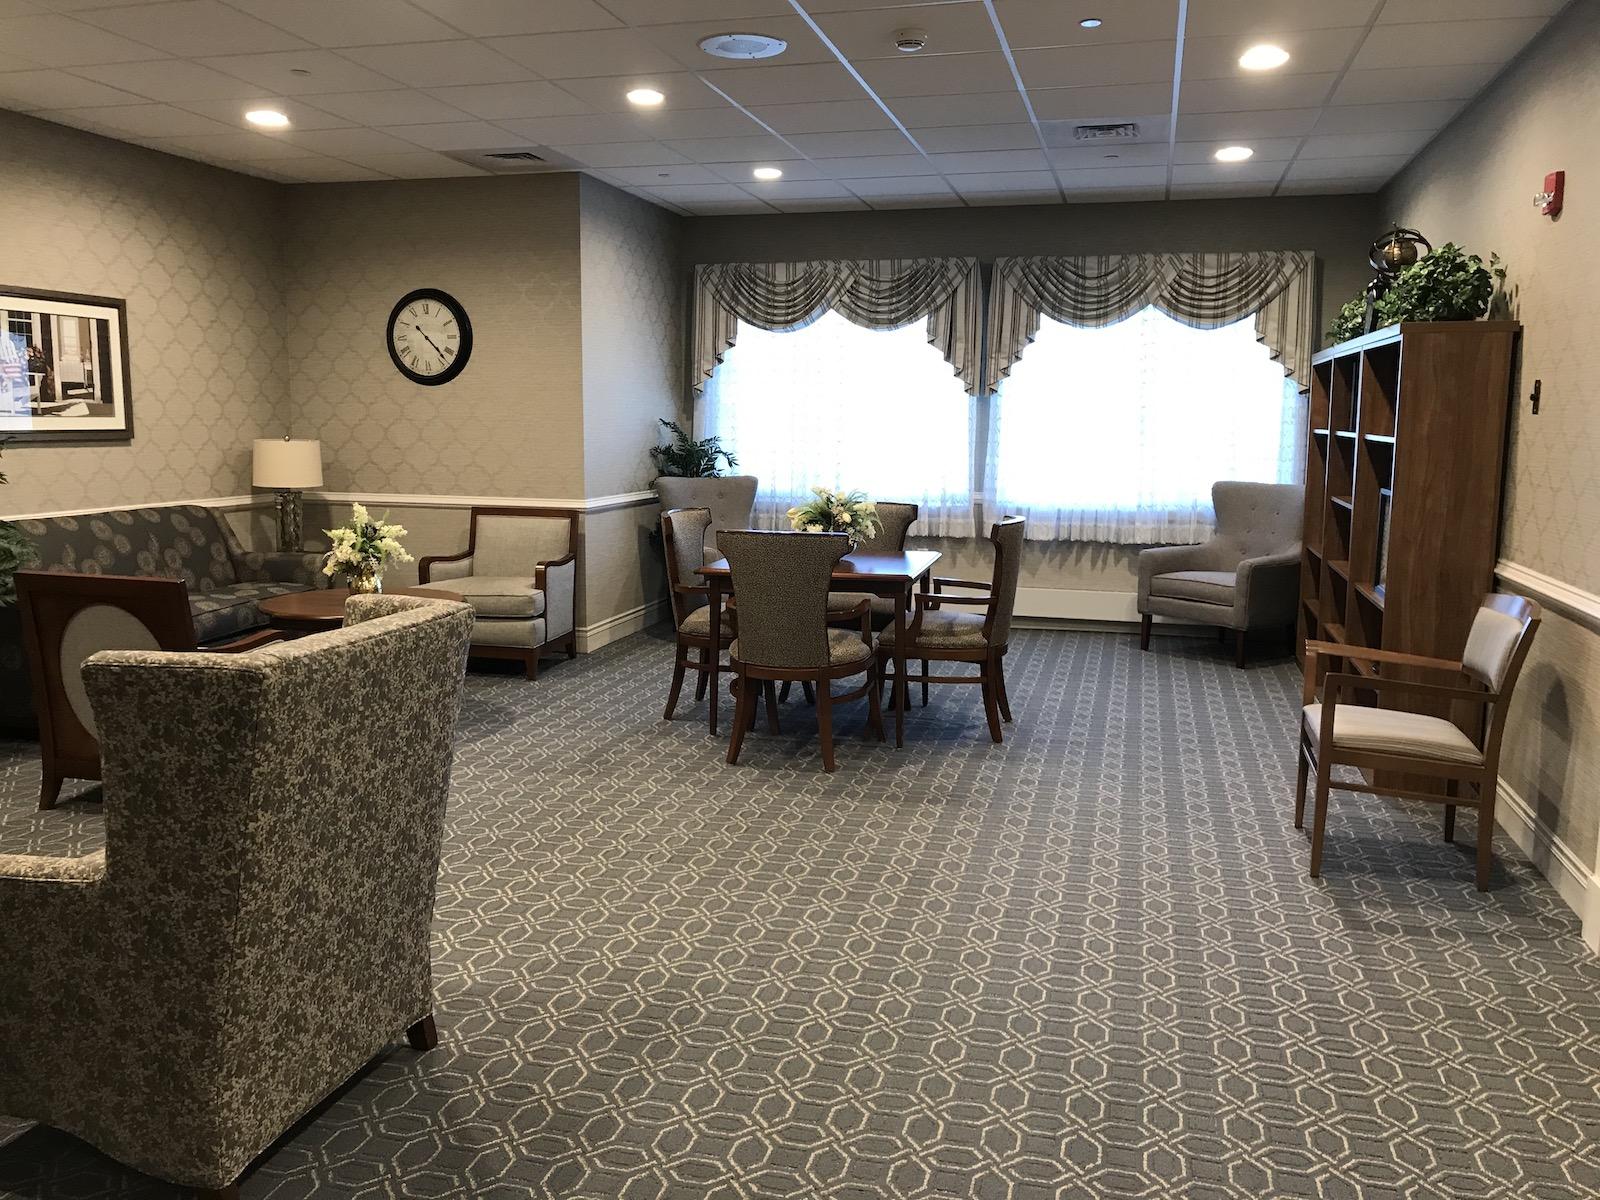 Port Healthcare Center Newburyport, MA - Whittier Health ...